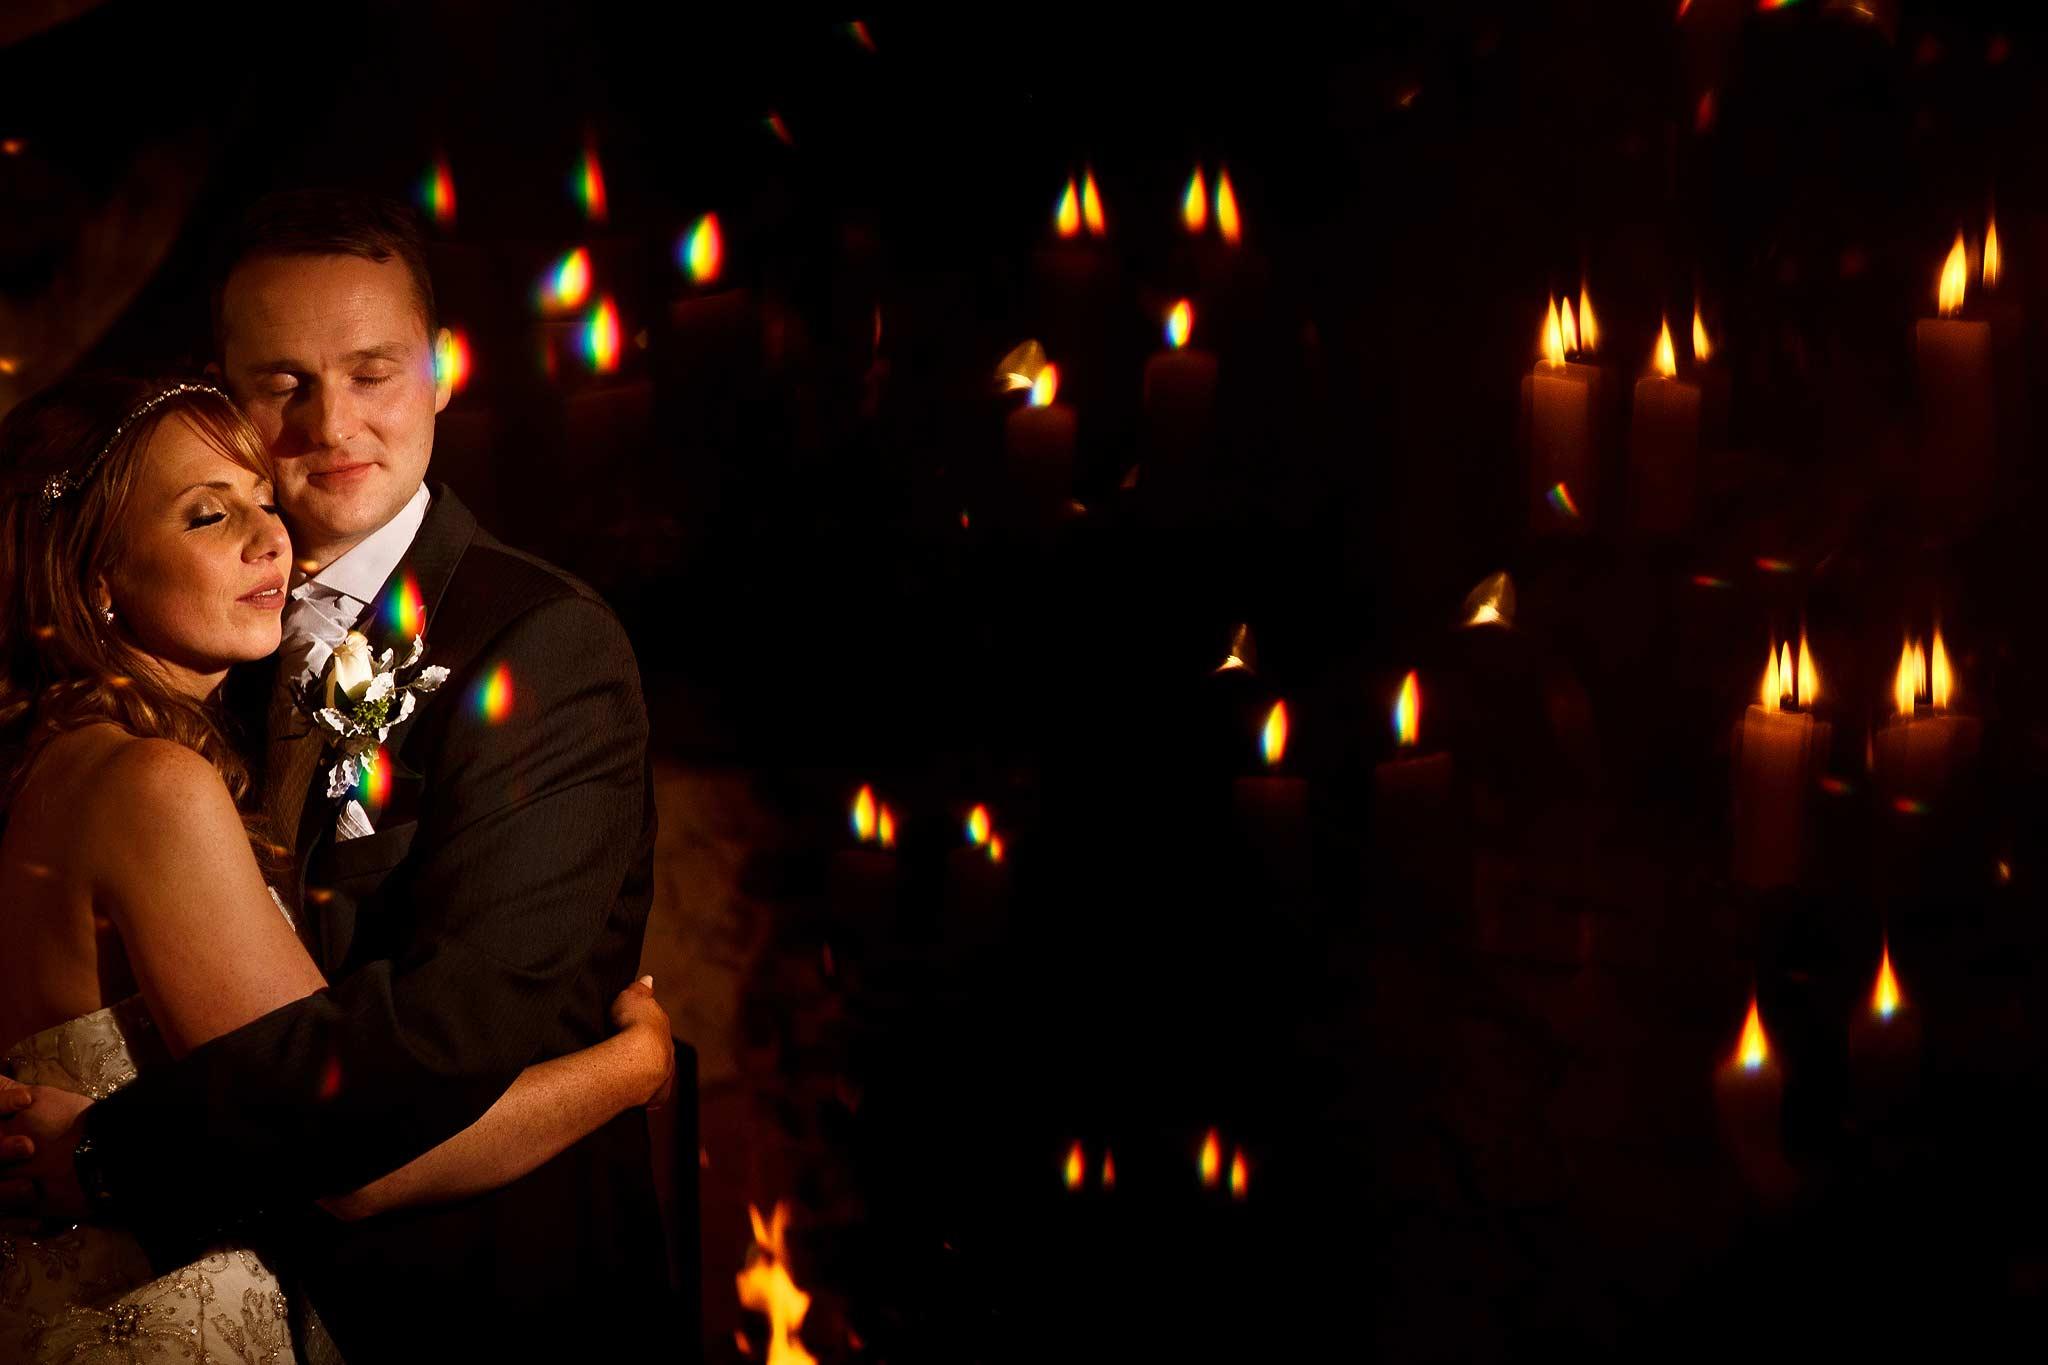 Creative wedding photograph of the bride and groom amongst all the candles at Samlesbury Hall wedding